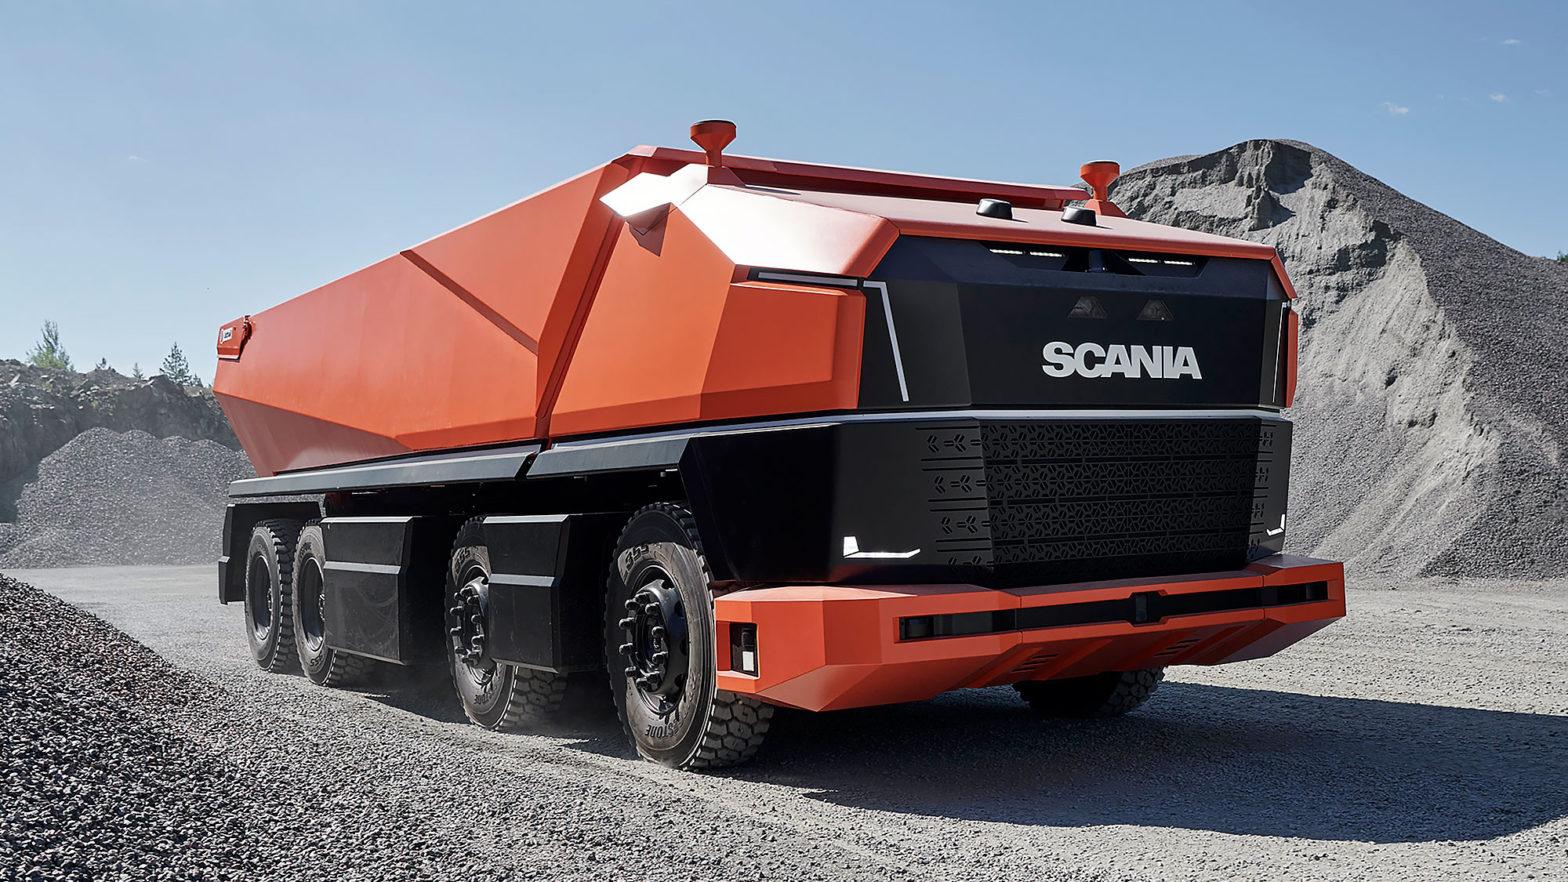 Scania AXL Autonomous Truck Concept